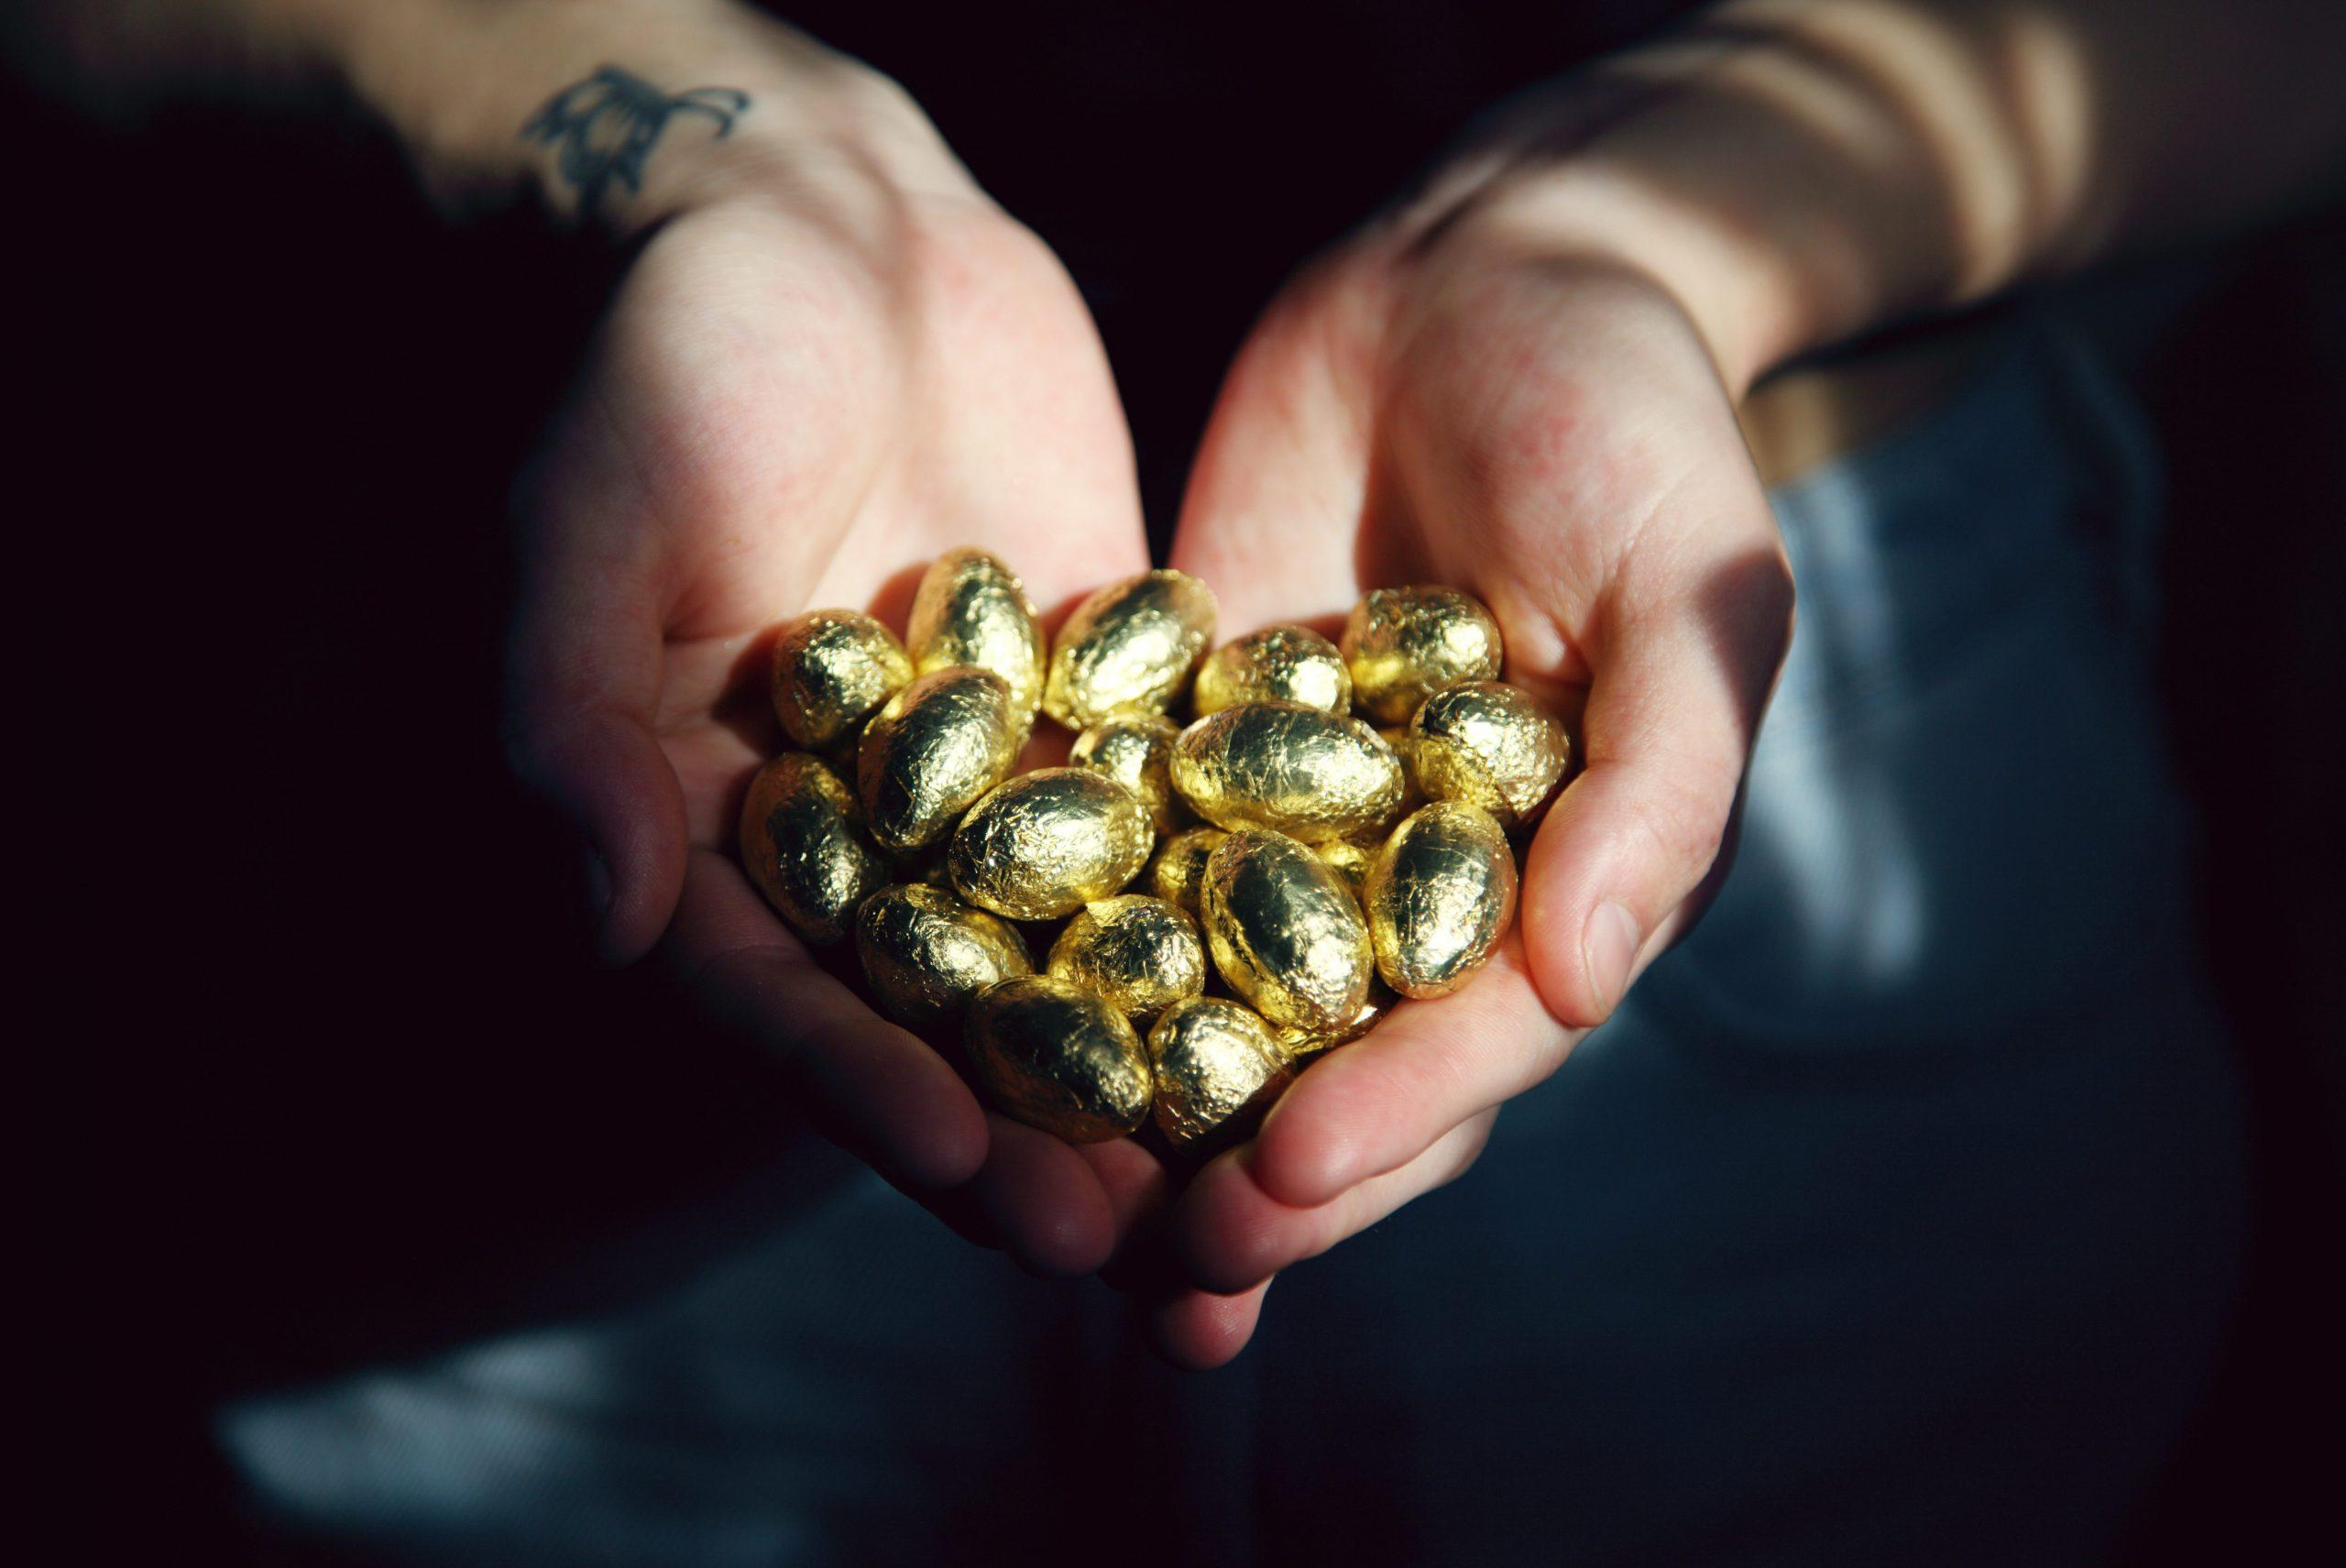 ESAT survey - value image - hands holding golden foil-wrapped eggs